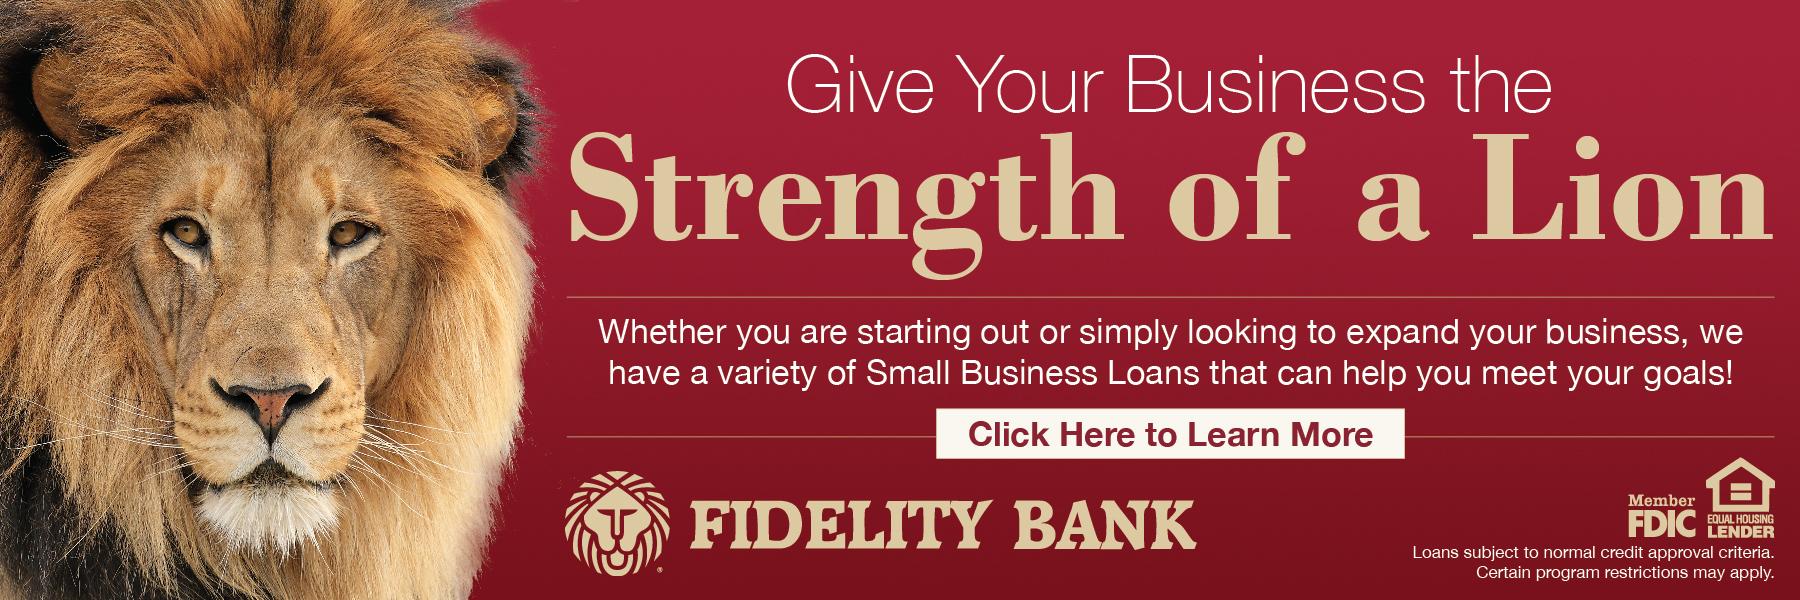 Fidelity_SBA SESBLC Digital Ad_1800x600-01 (1)